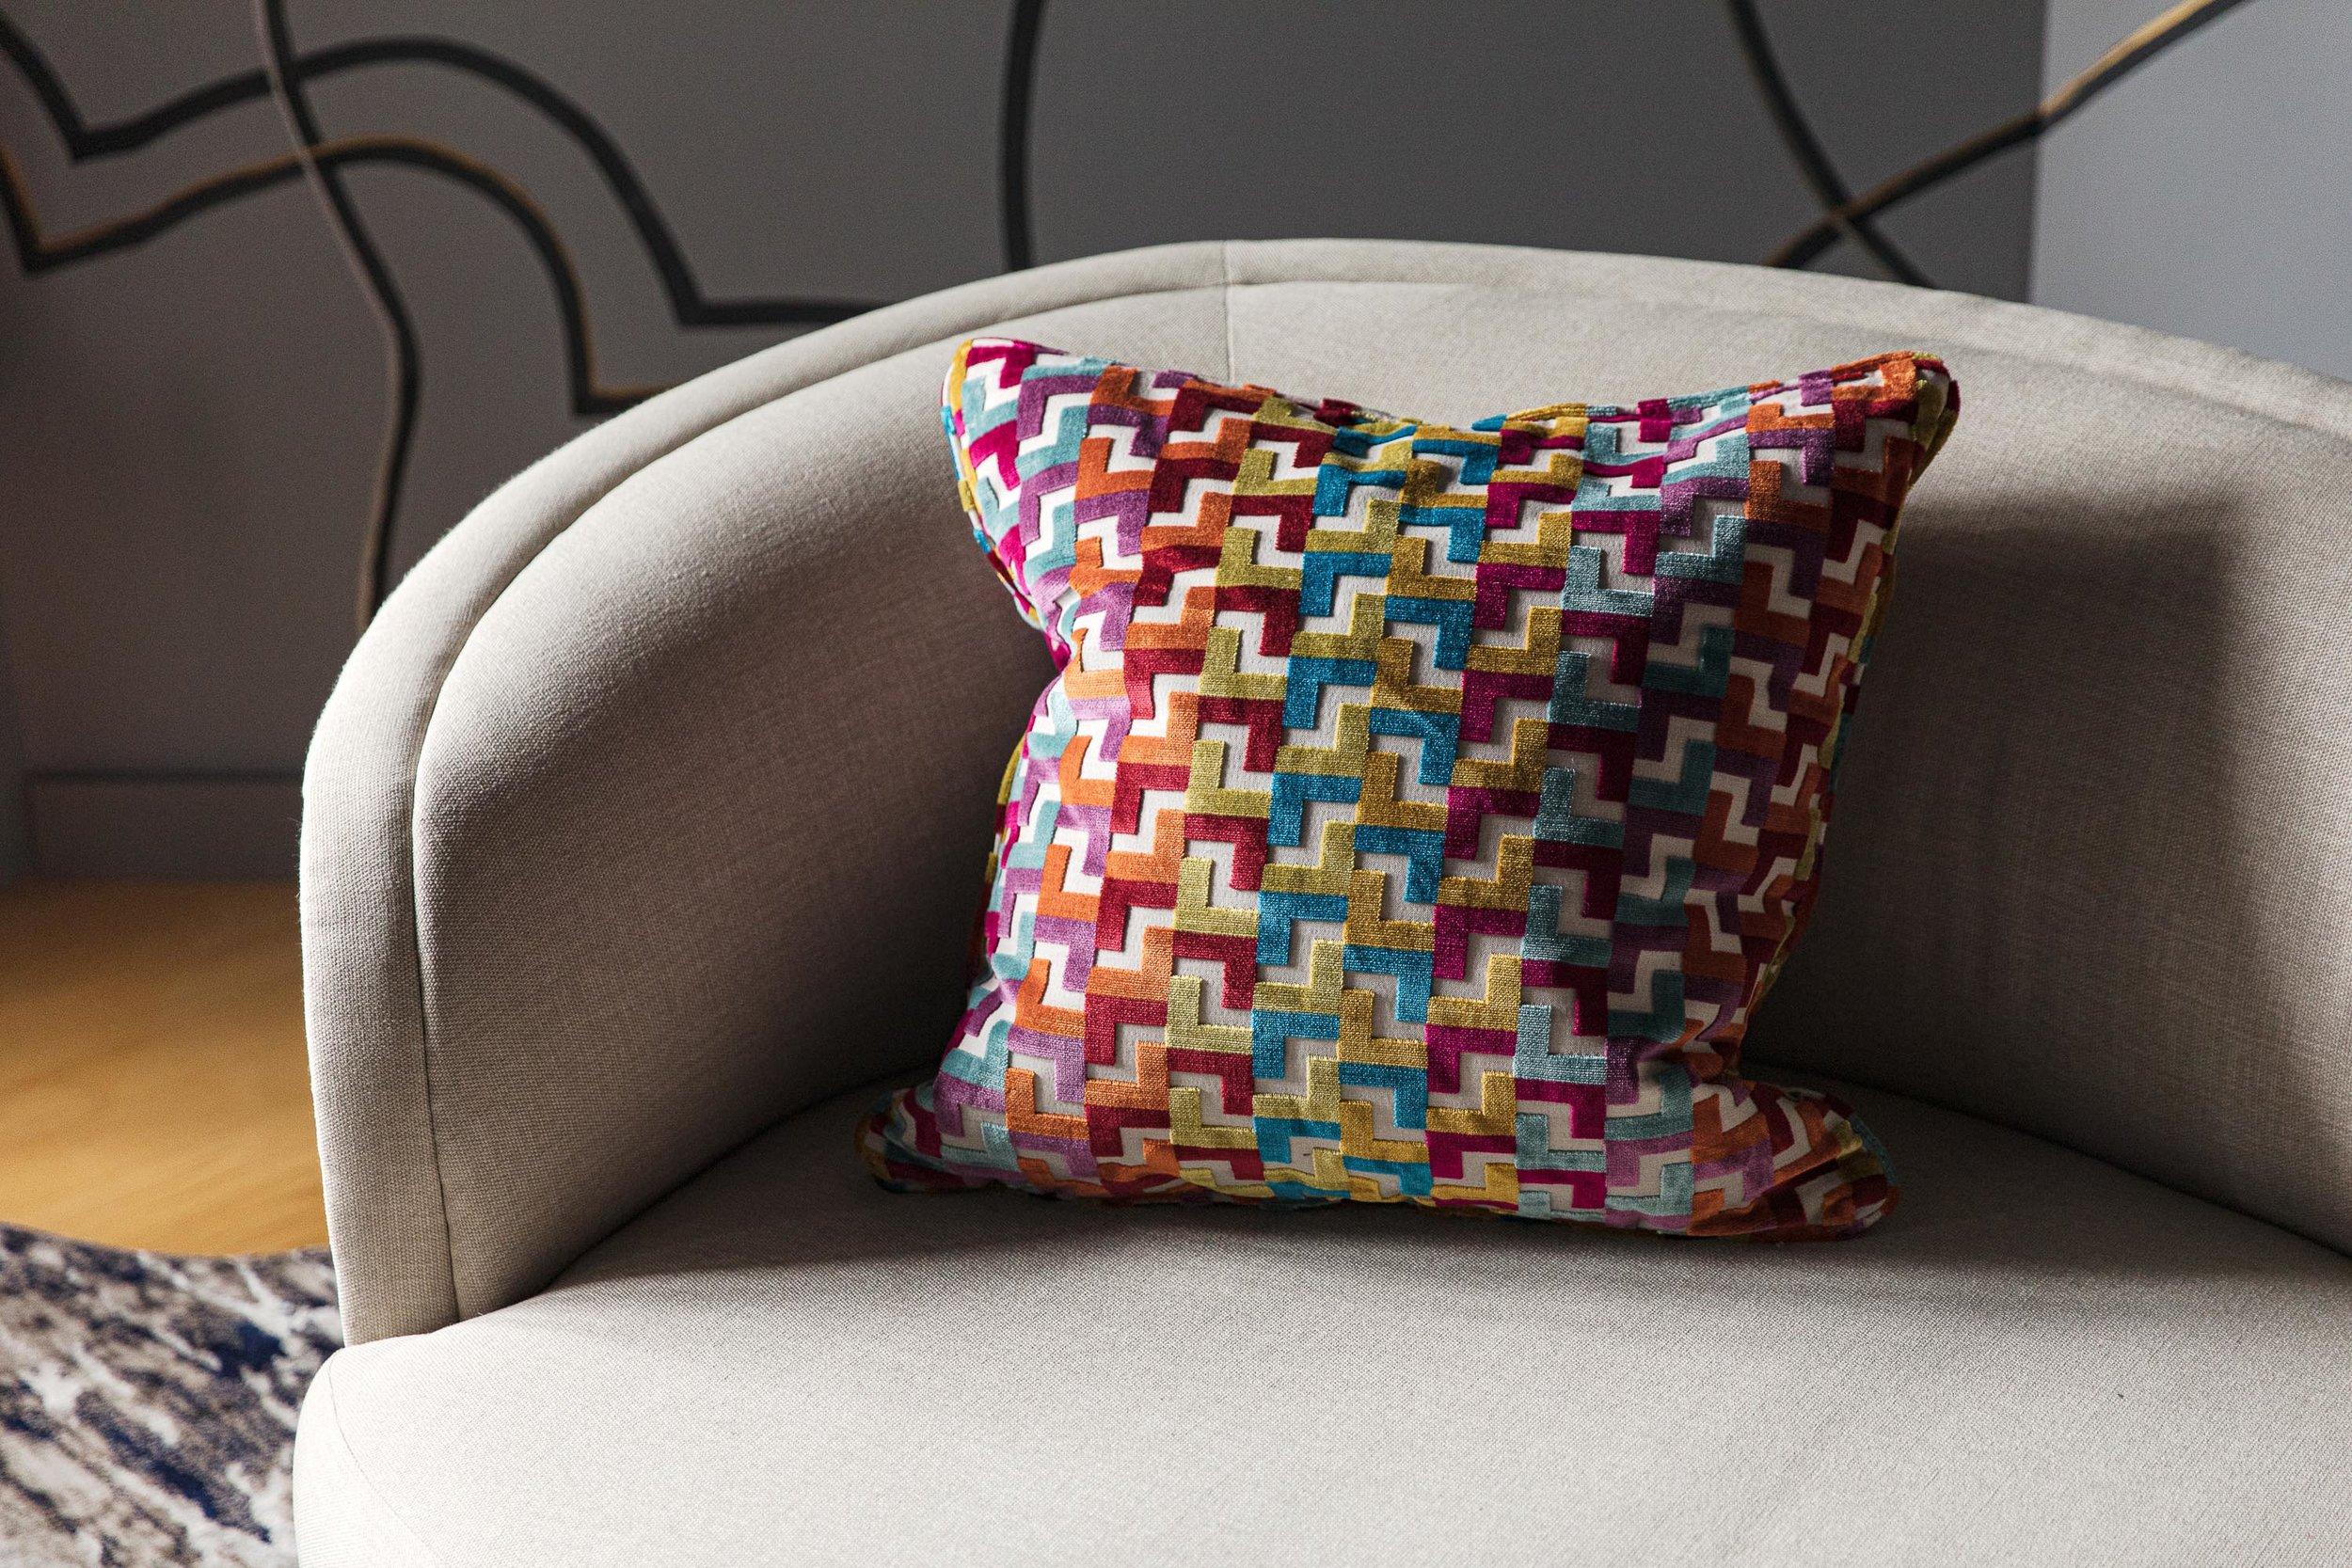 Boston curved sofa design by Dane Austin Design